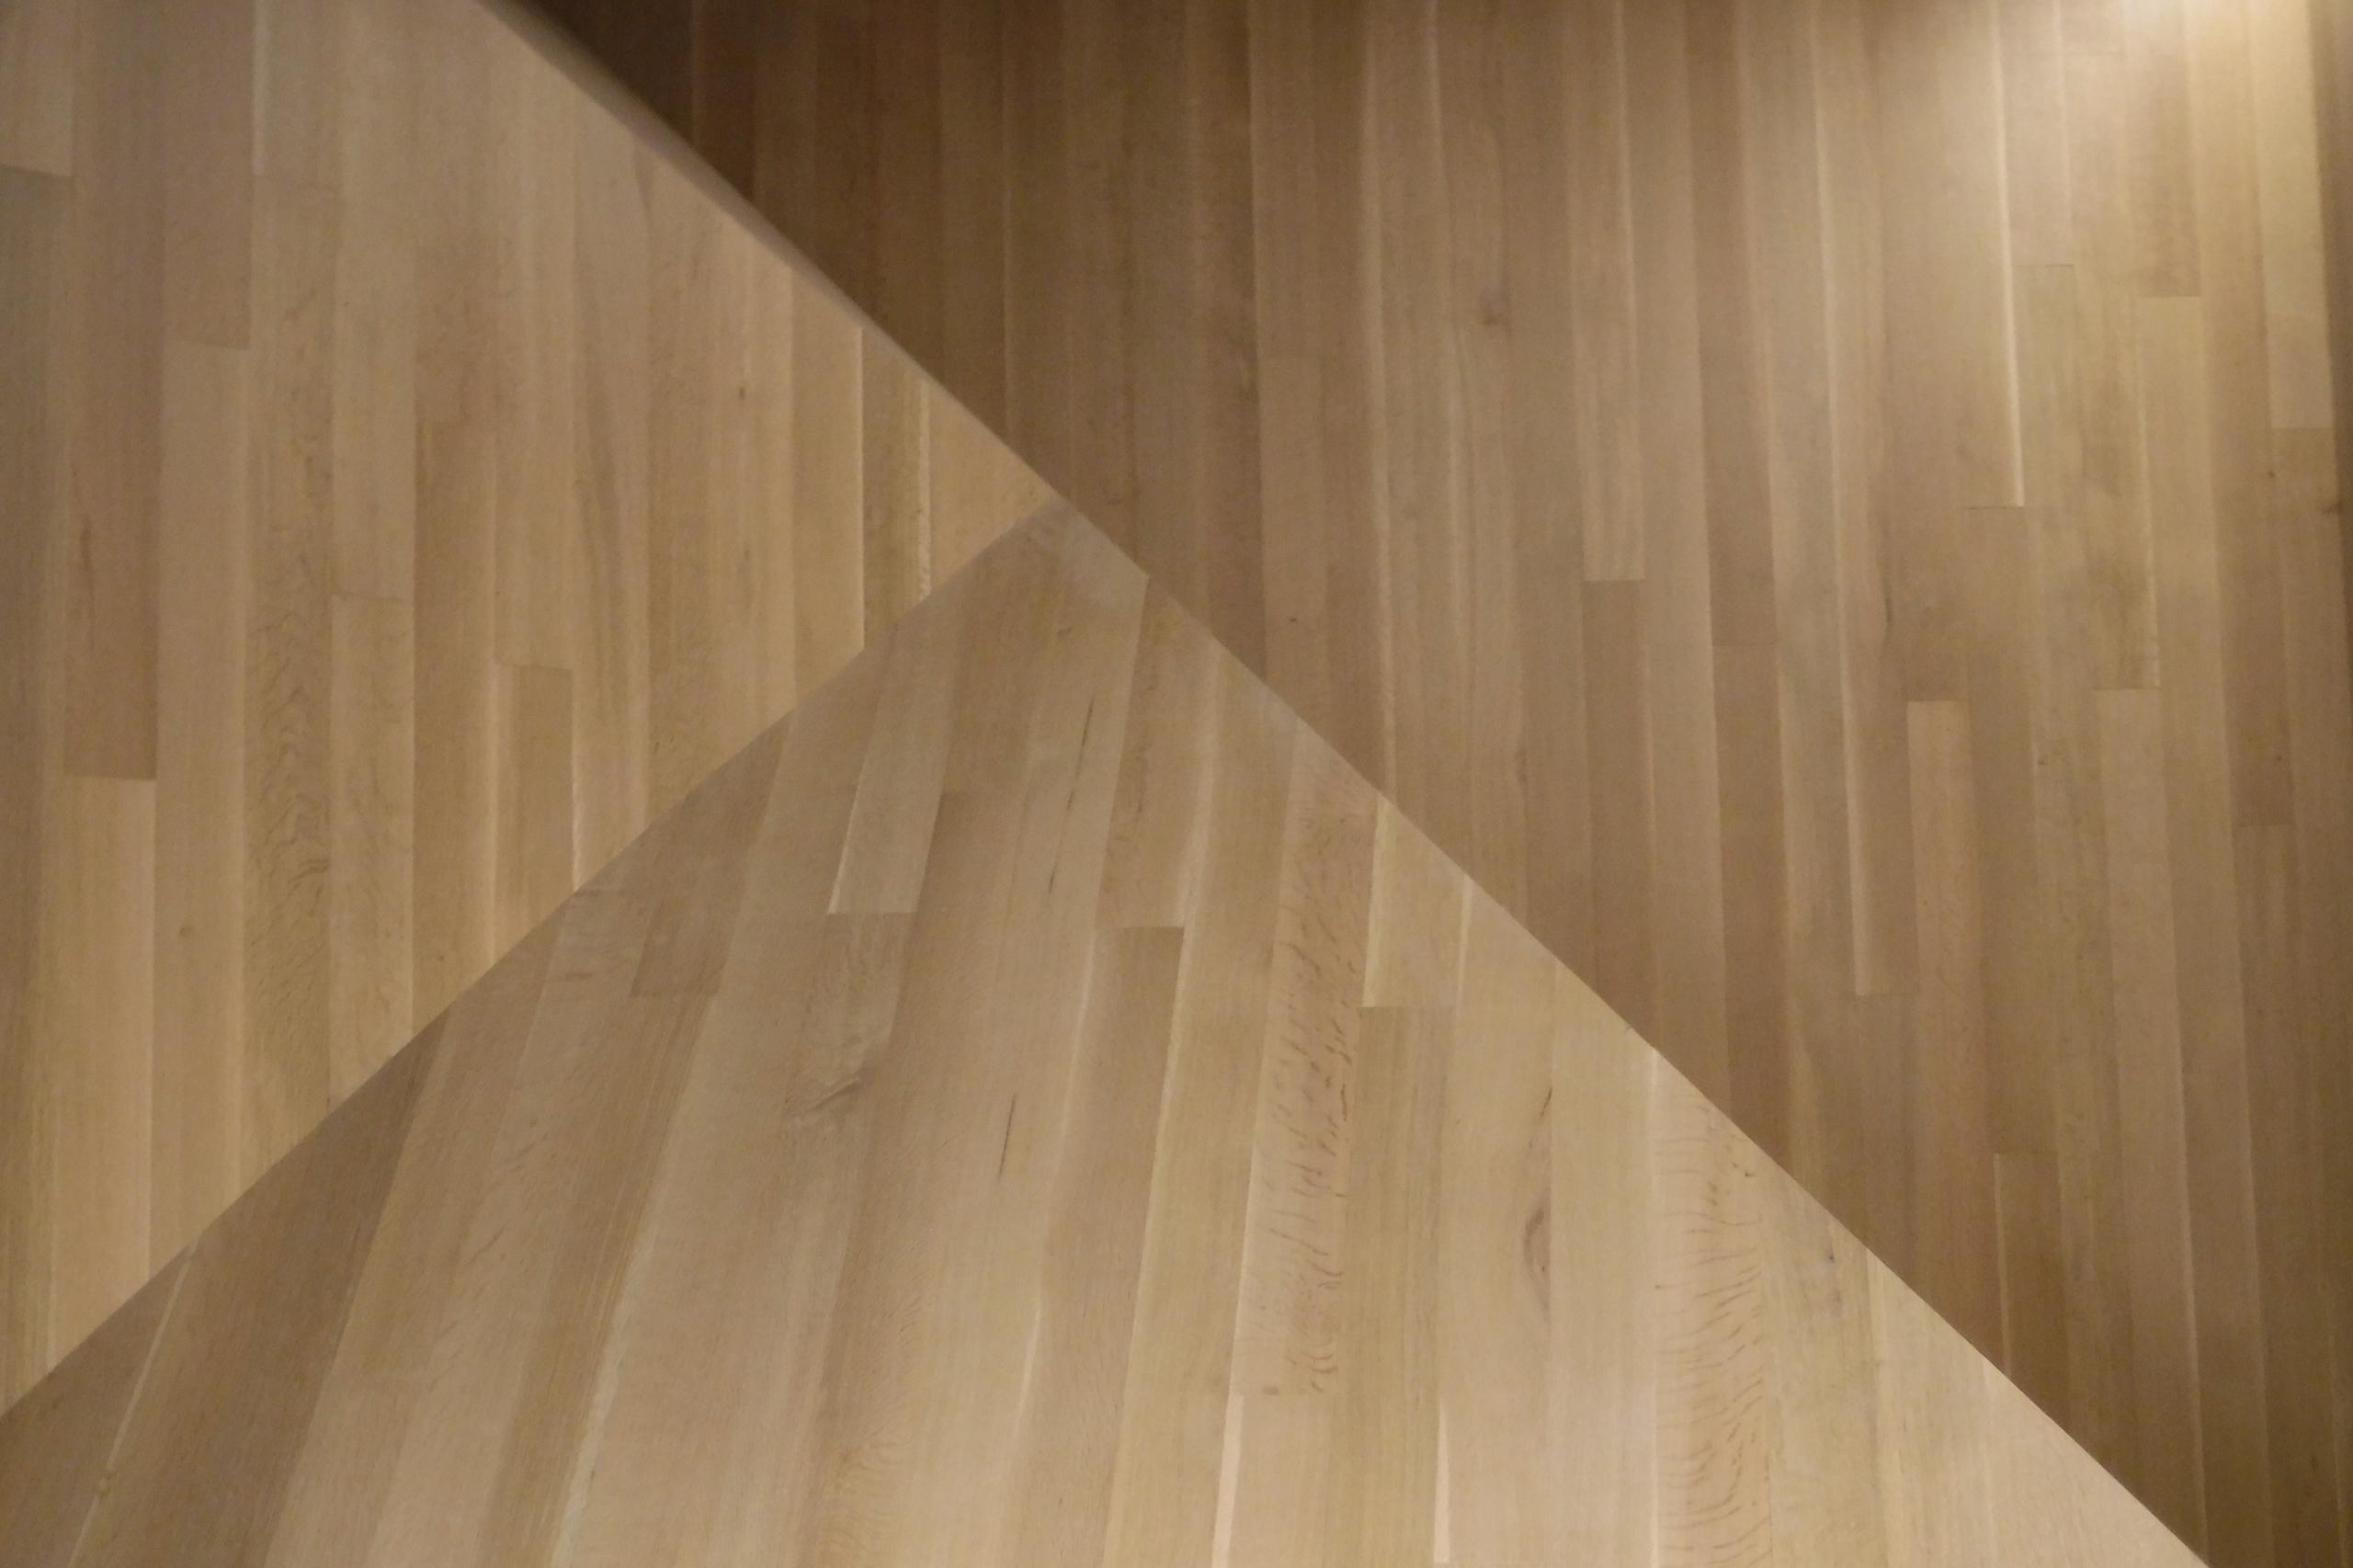 architecture, minimalism - jgreinerferris | ello